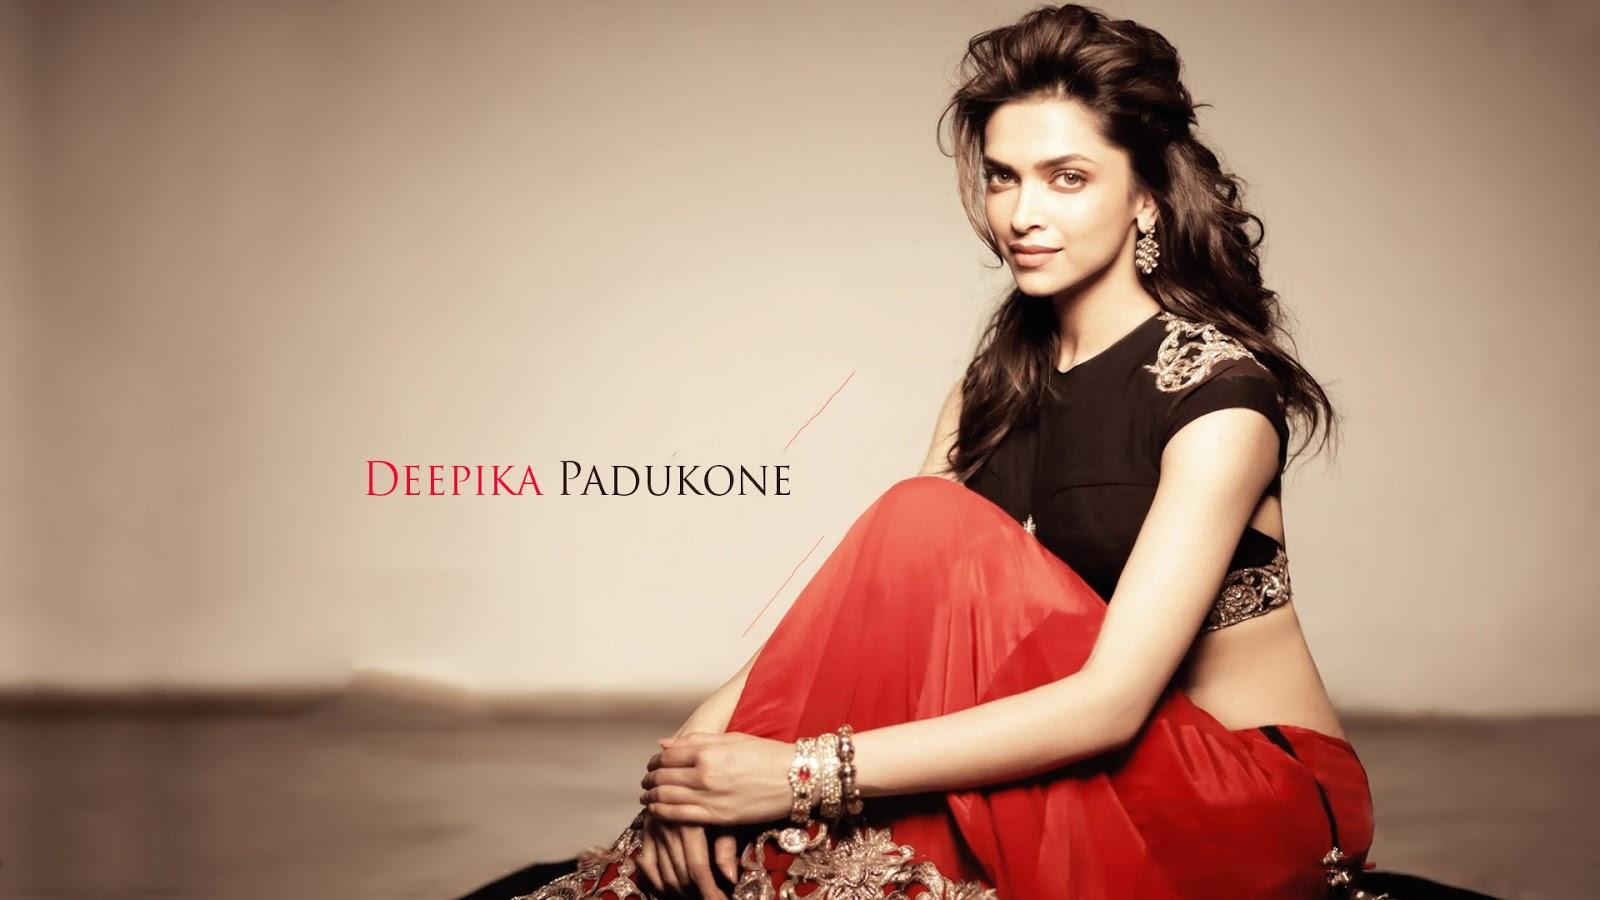 Wallpaper download deepika padukone - Deepika Padukone Hd Wallpaper For Free Download